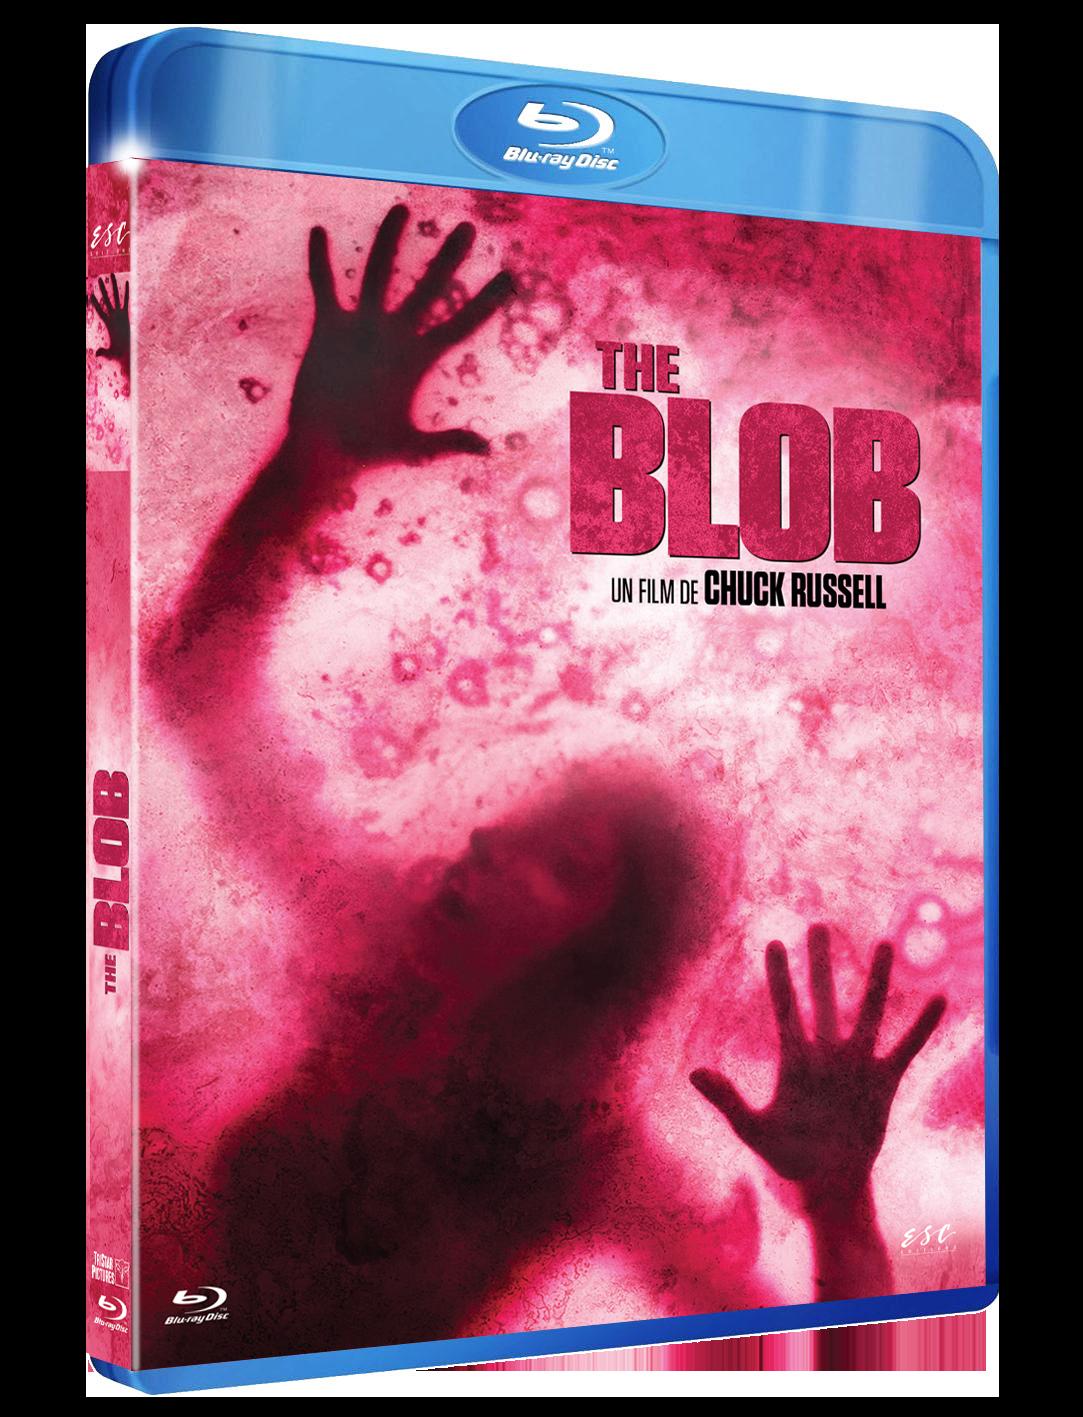 THE BLOB 1988 - BRD